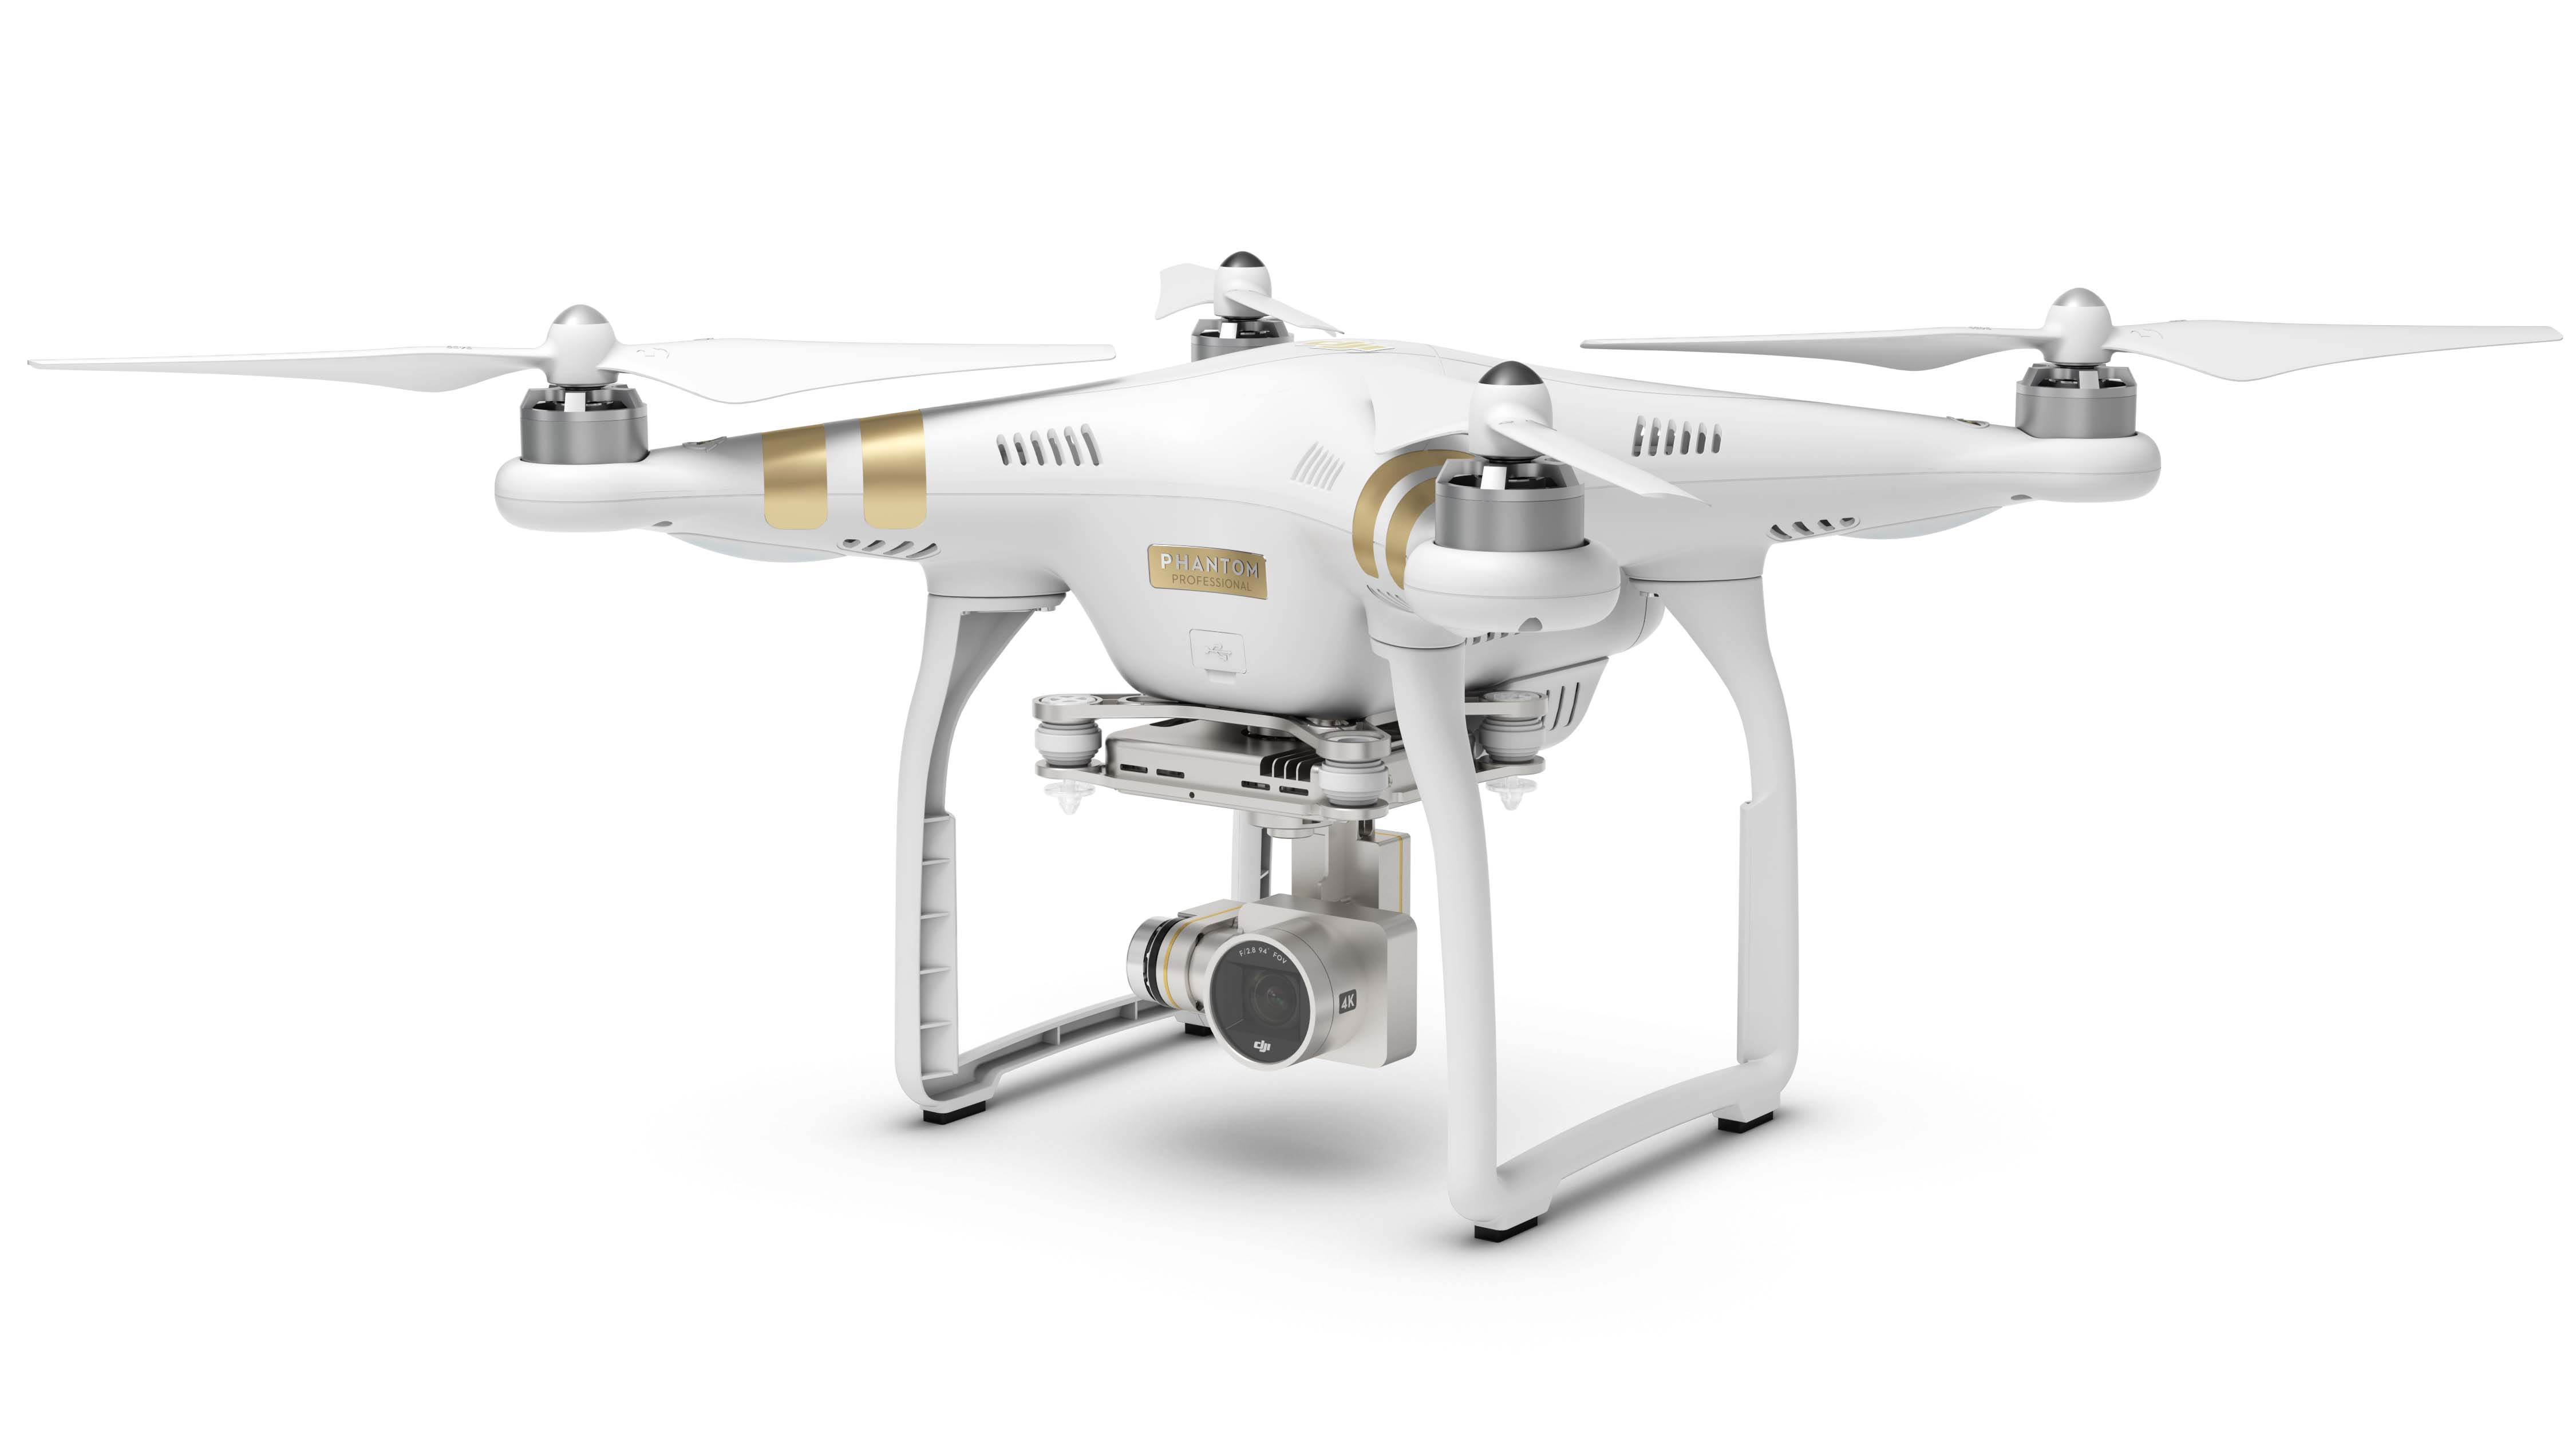 DJI Reveals Its Next Generation Video Drone The Phantom 3